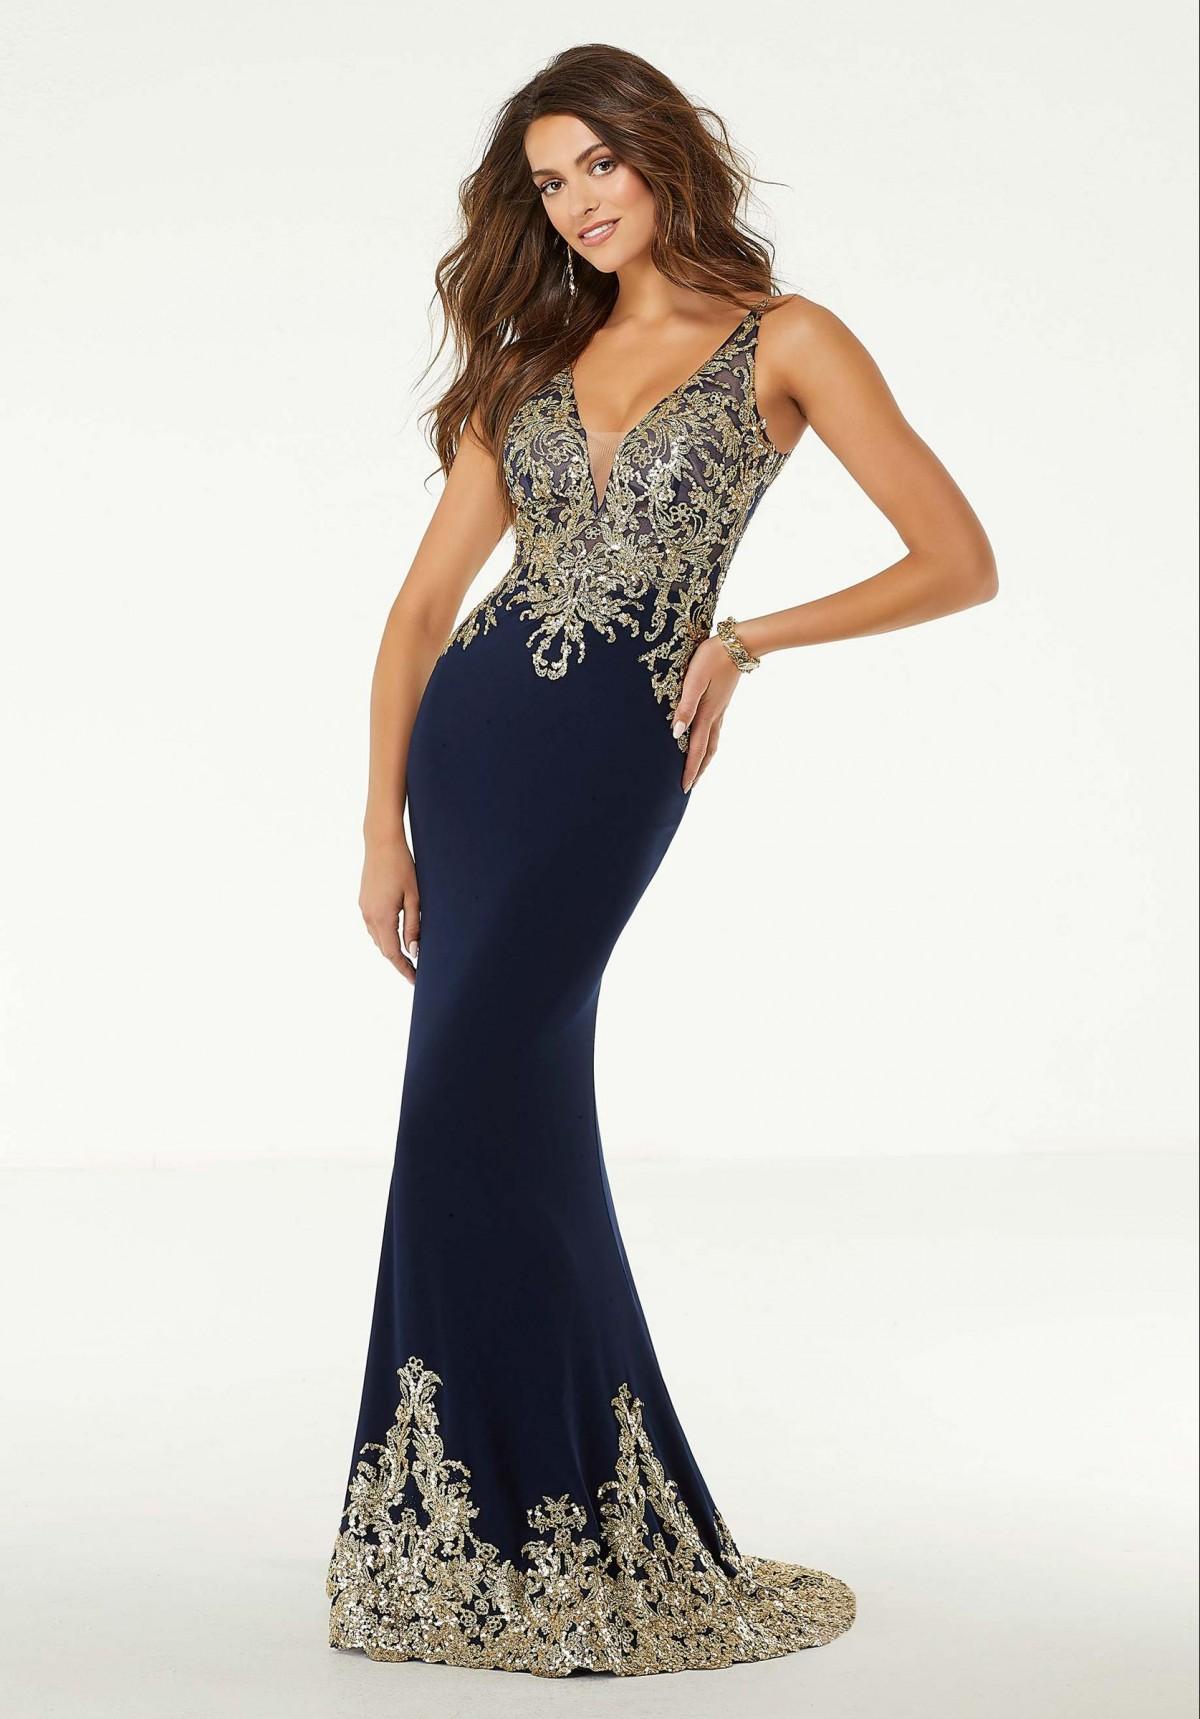 Moirlee Navy Blue Evening Gown